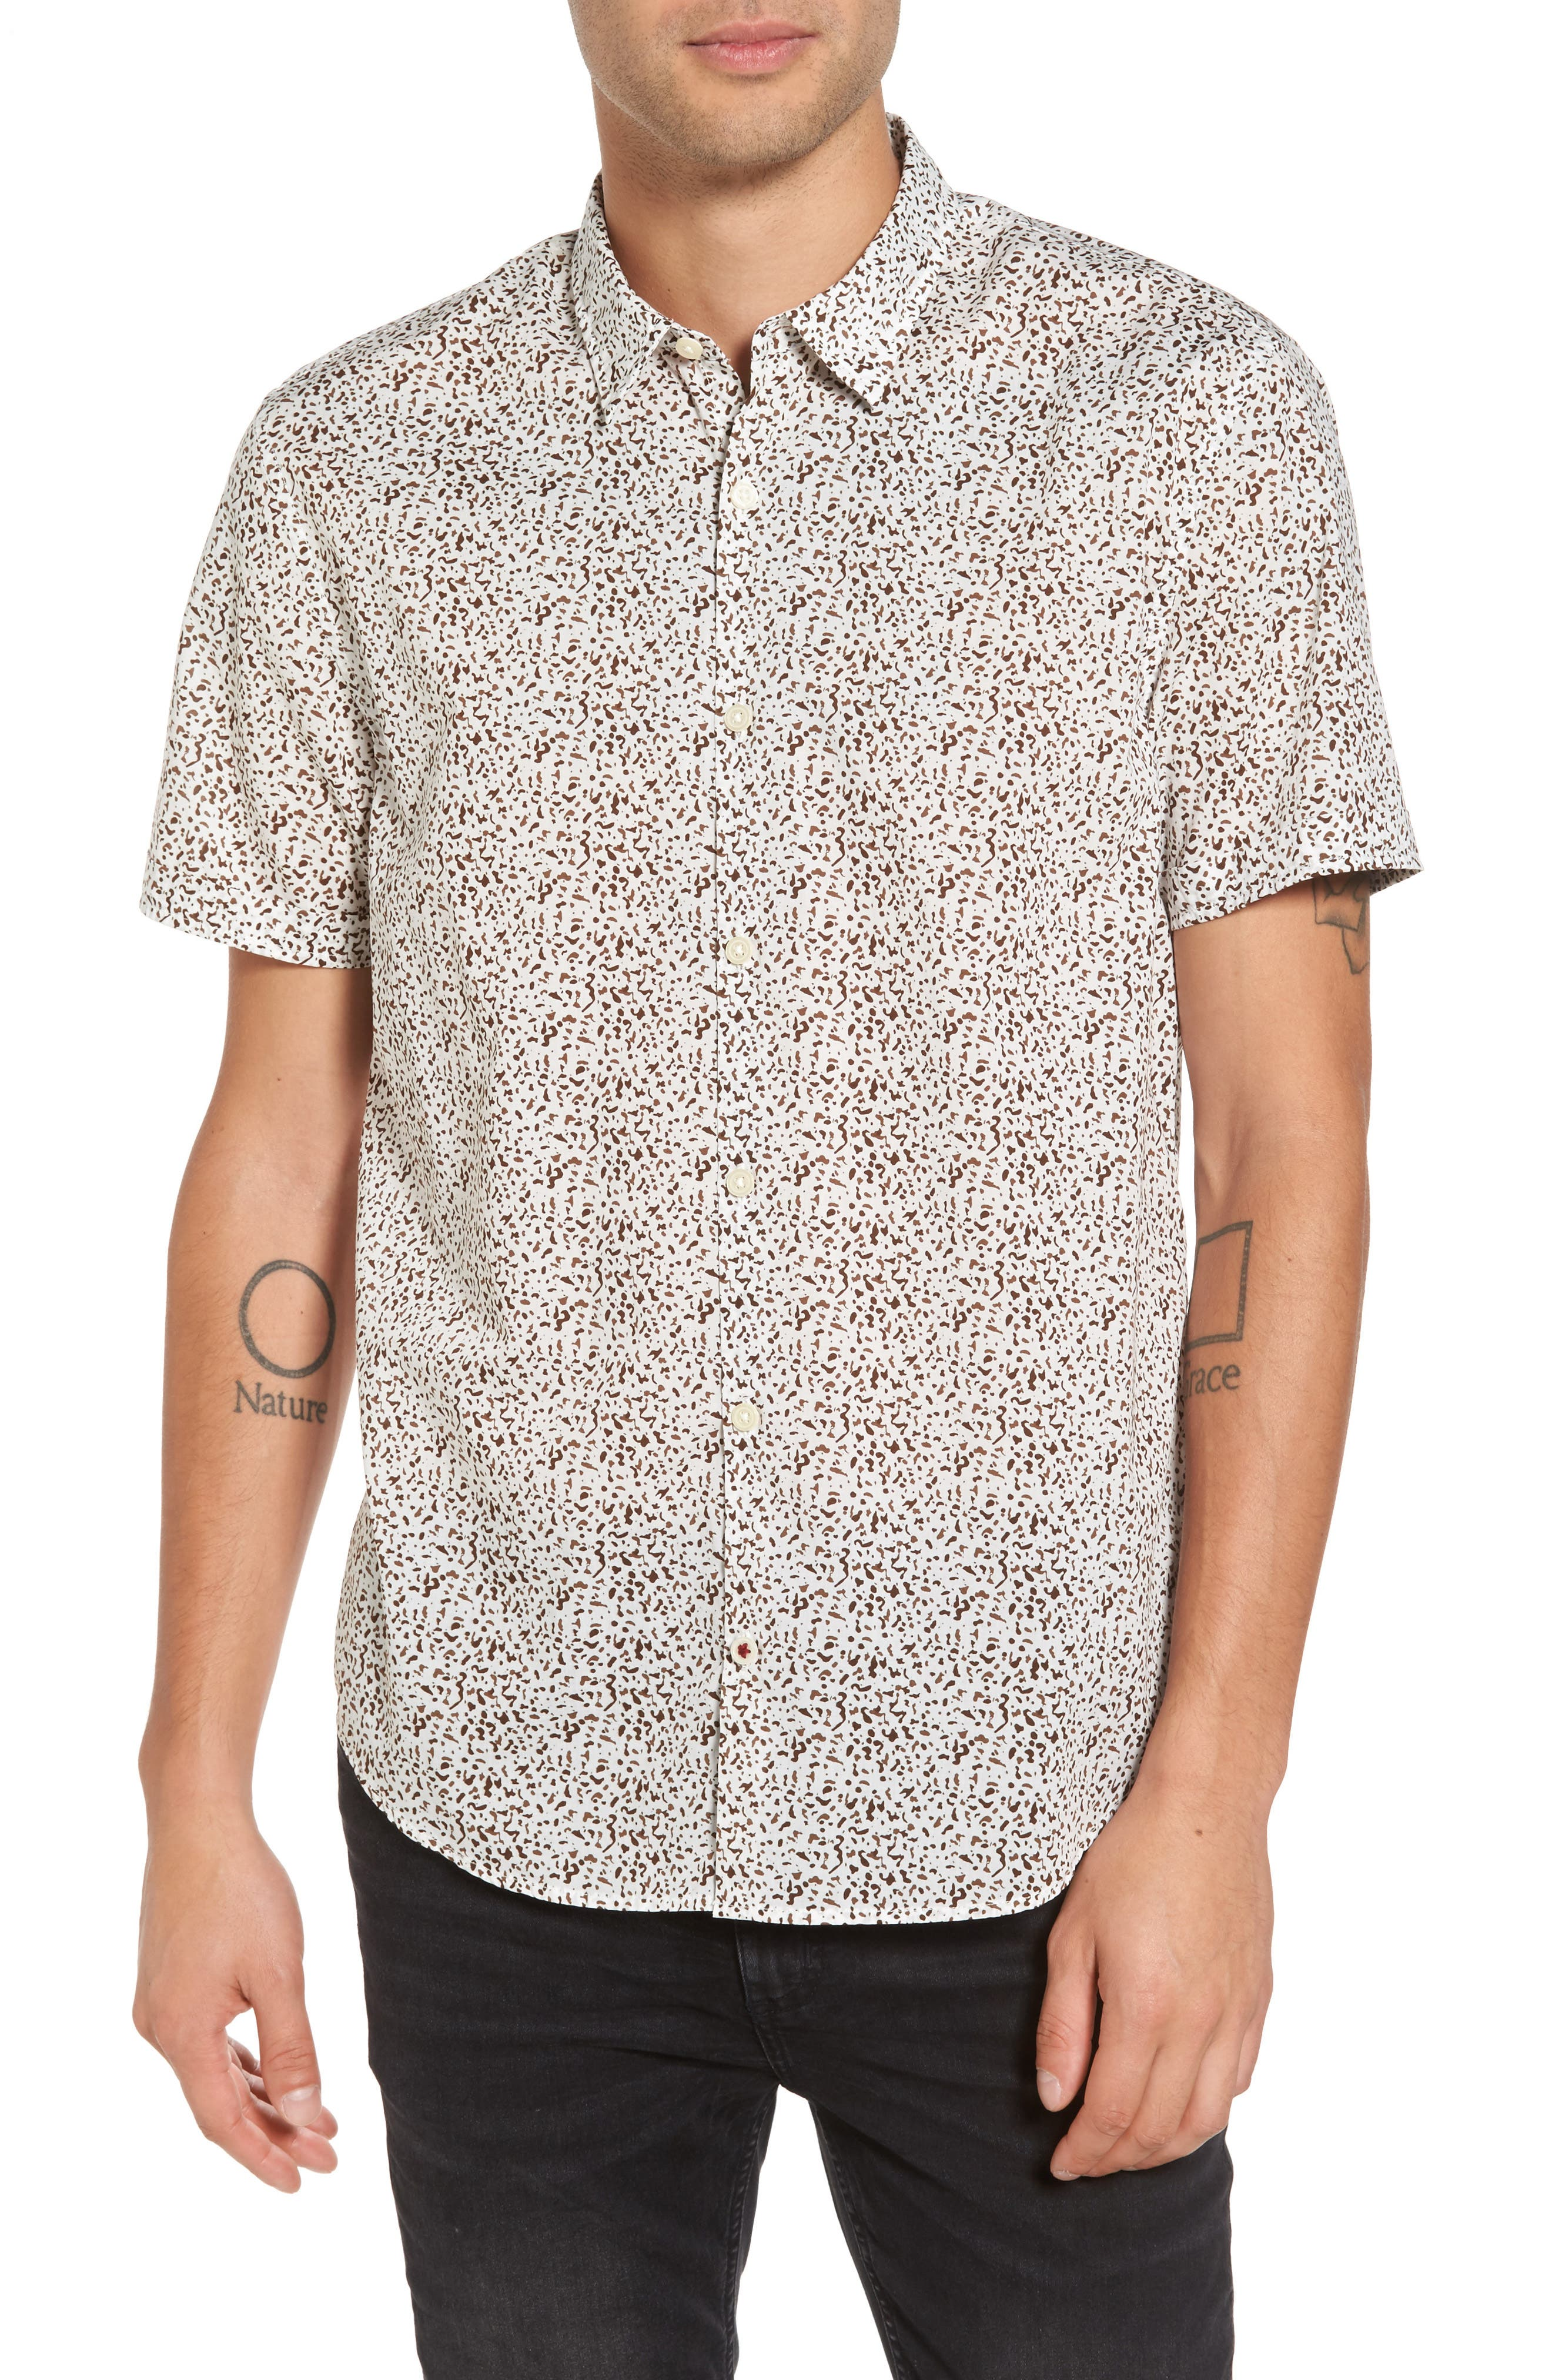 Alternate Image 1 Selected - Star USA Slim Fit Animal Print Short Sleeve Sport Shirt